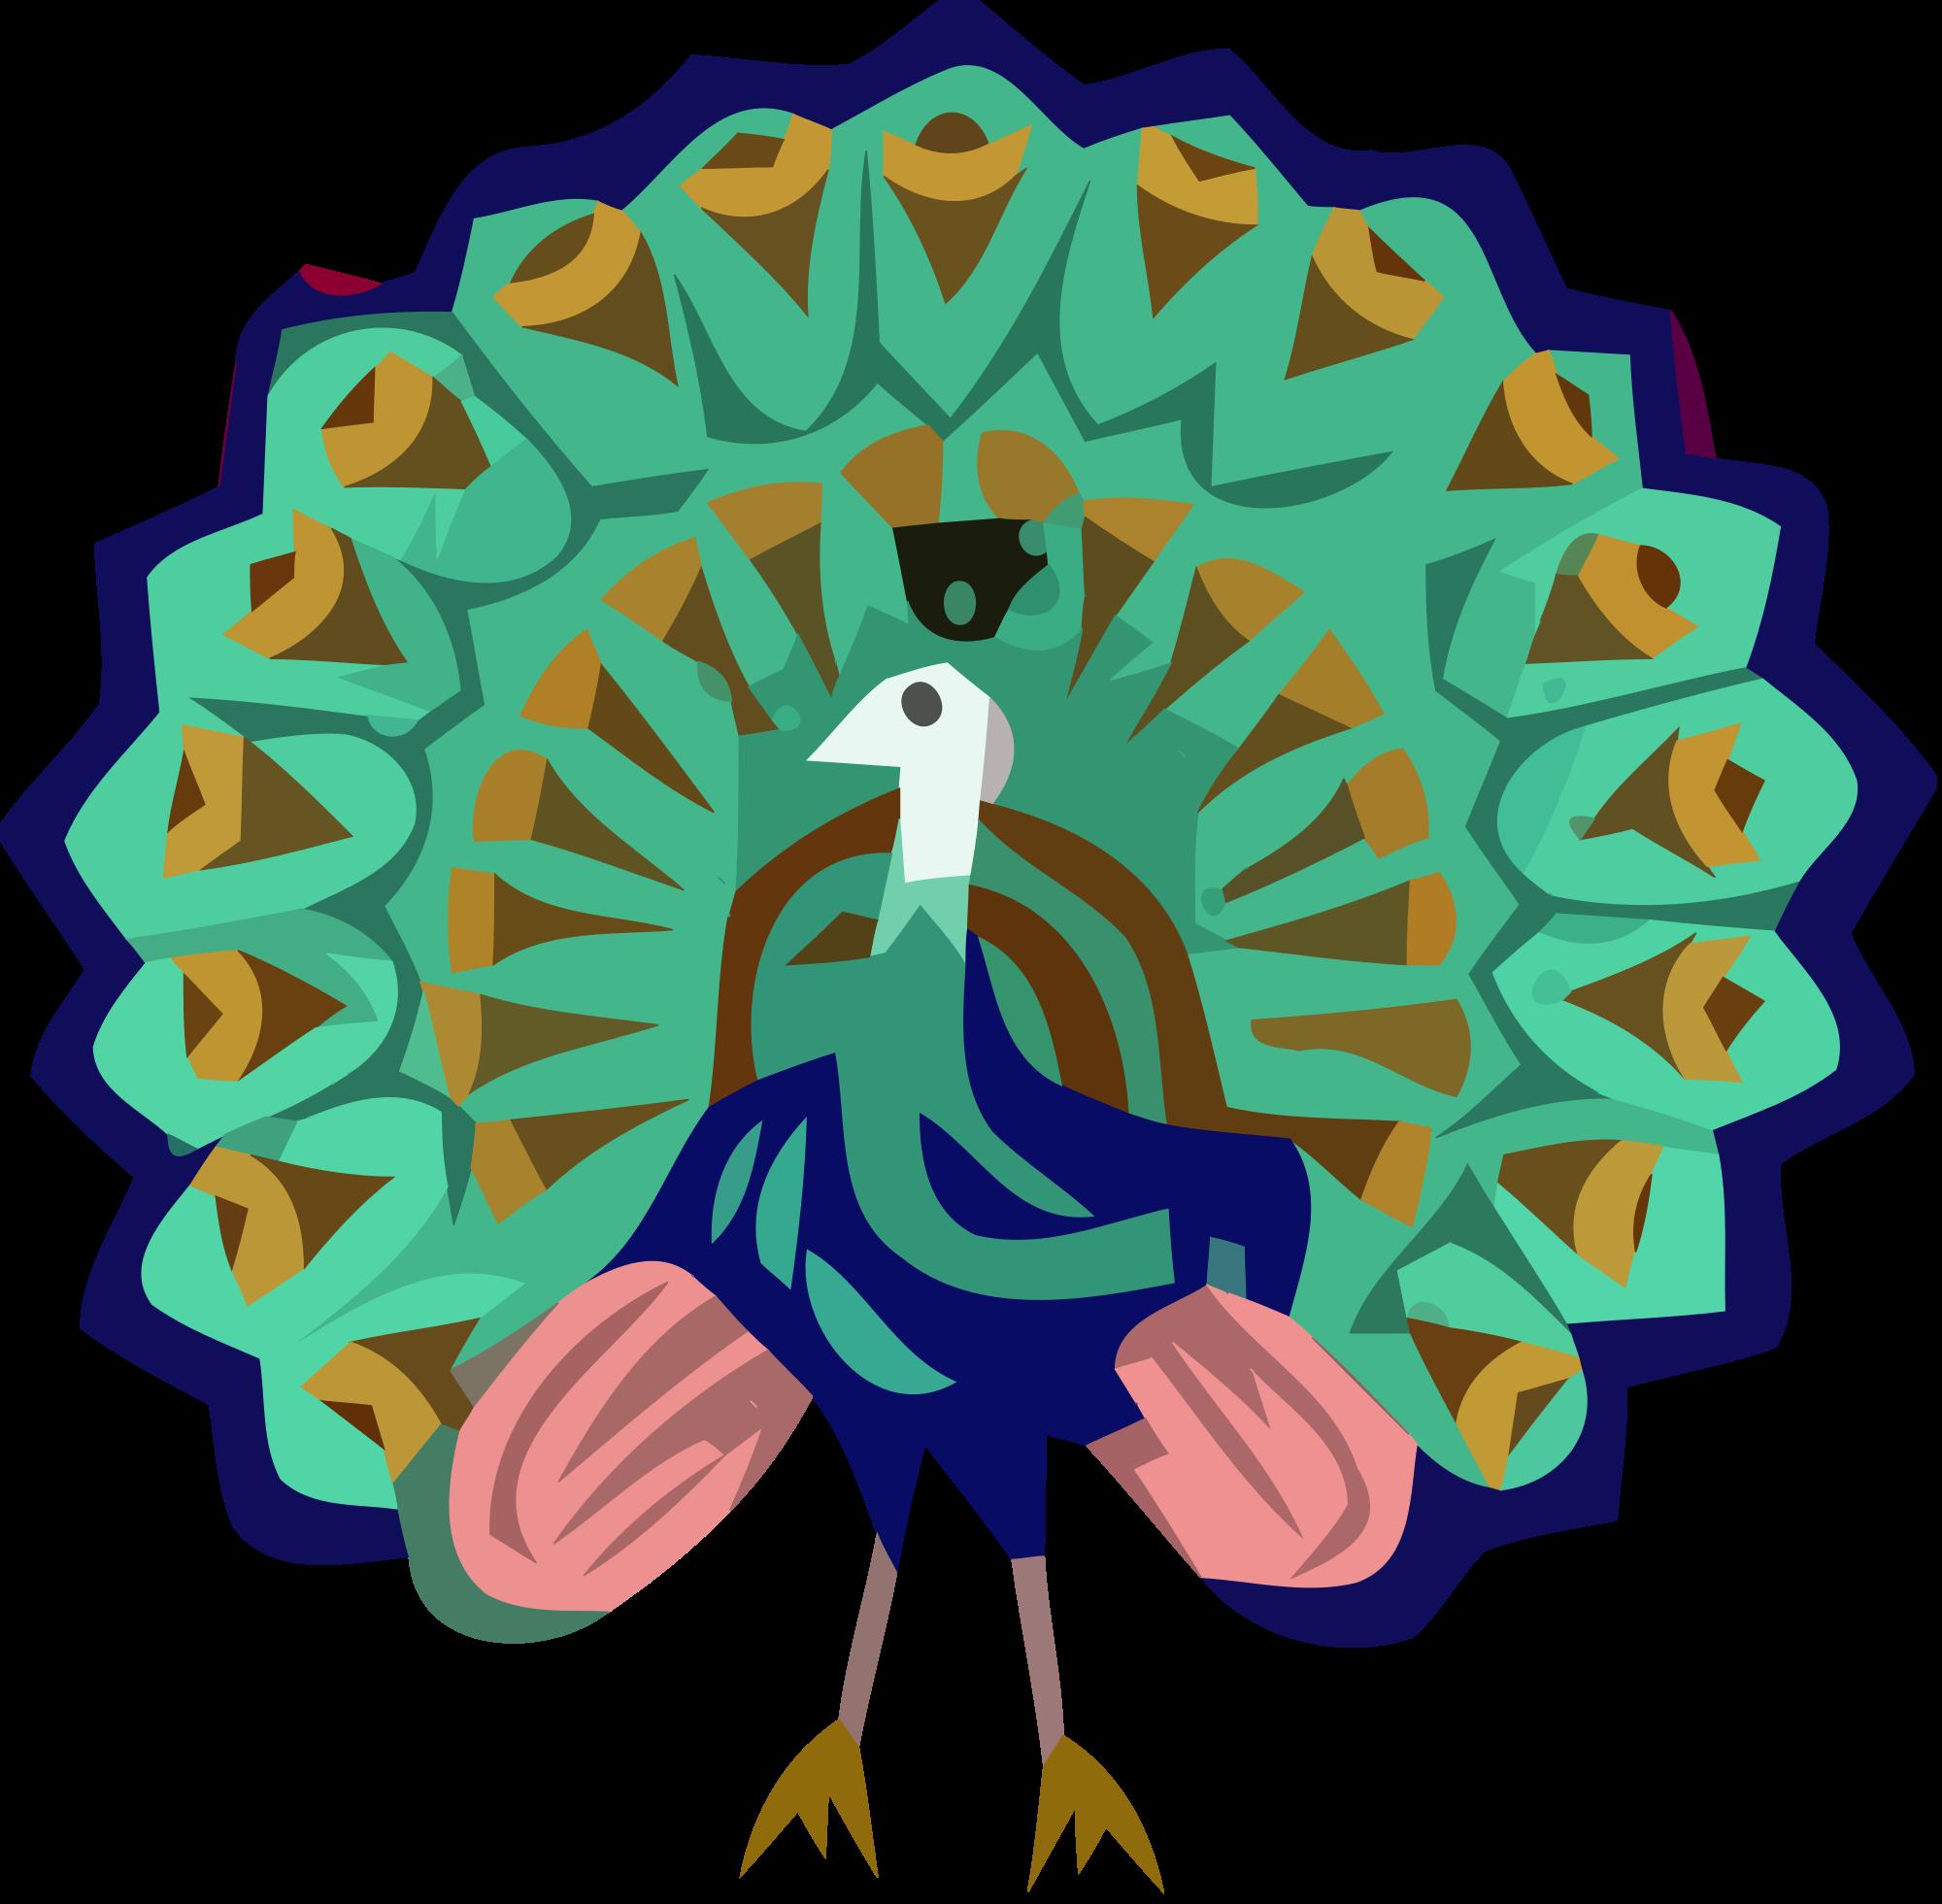 Peacock svg #5, Download drawings